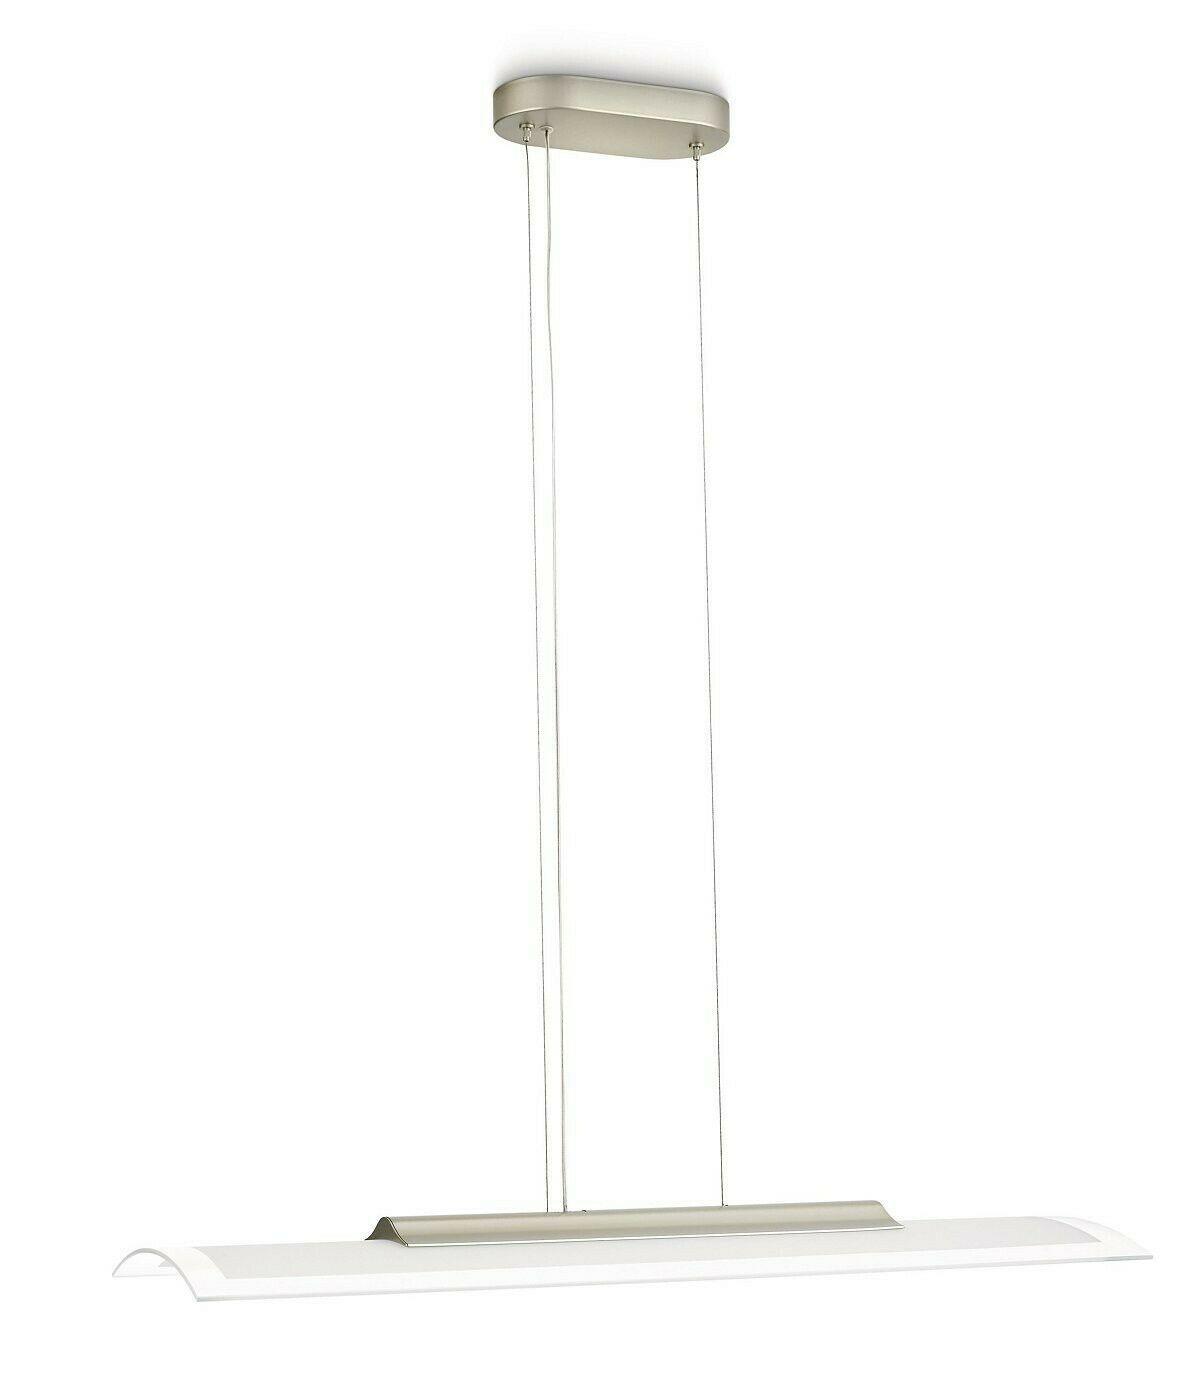 Esstischlampe Led Modern